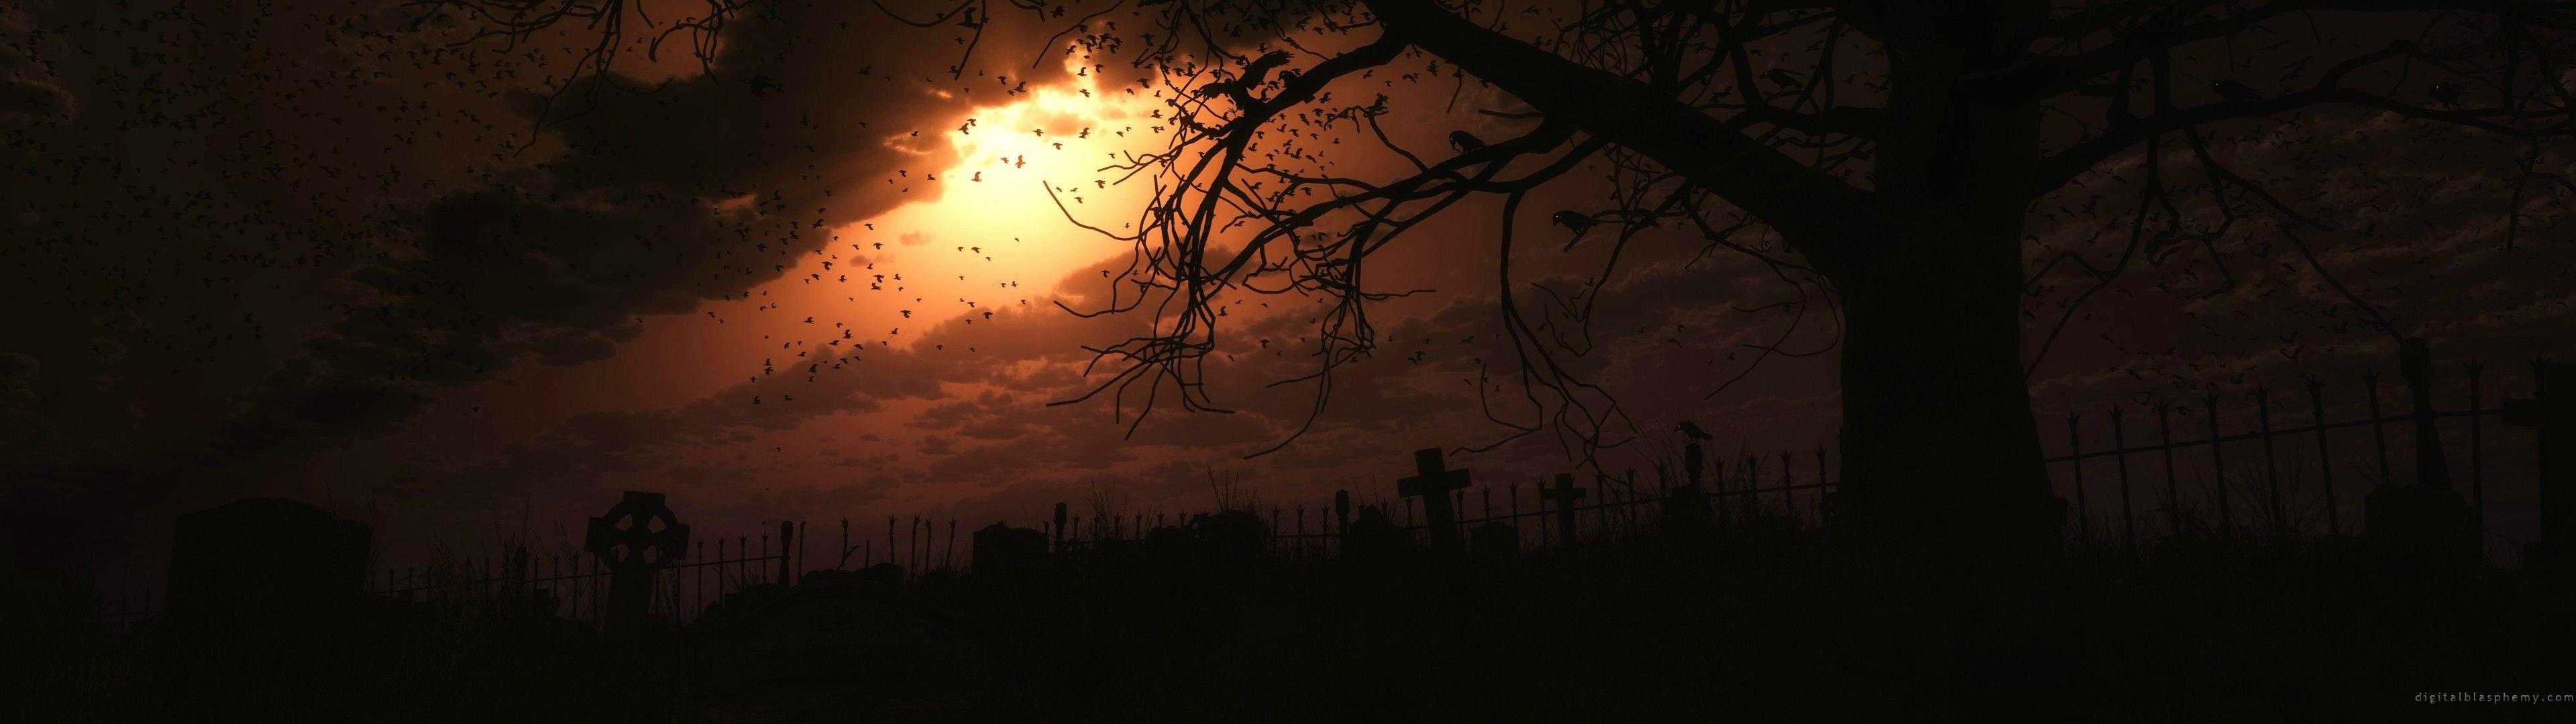 Spooky Halloween Wallpaper 3840x1080 Dual Monitor